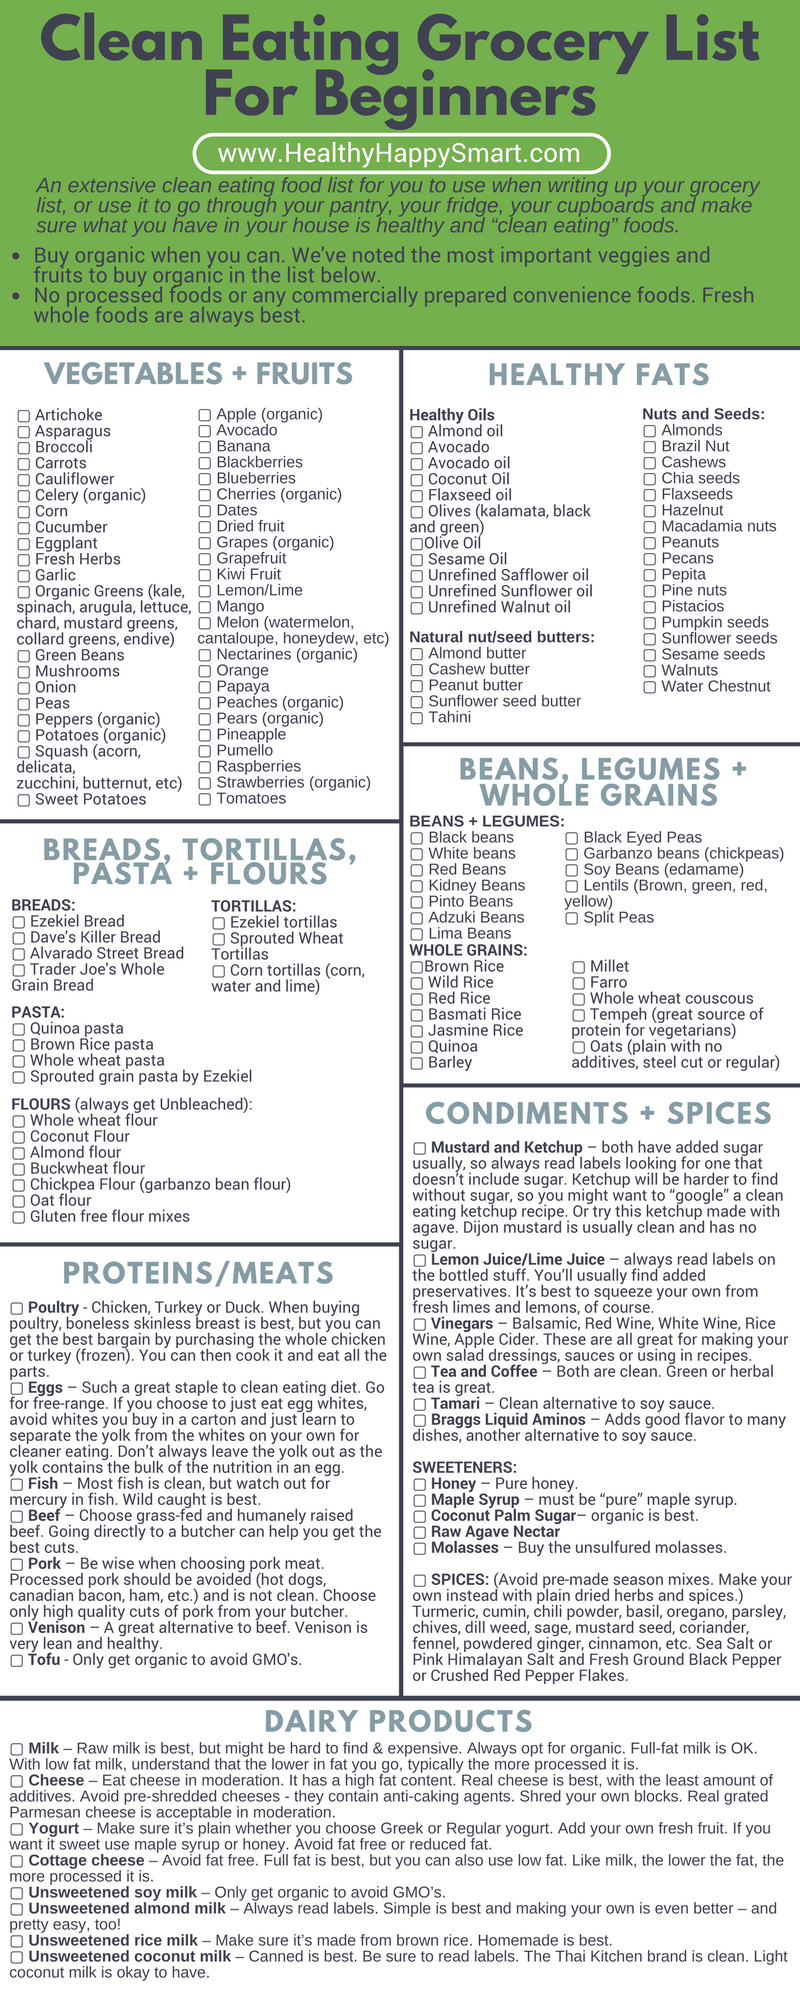 Clean Eating Grocery List • Healthy Food List • Healthy.happy.smart. - Gluten Free Food List Printable